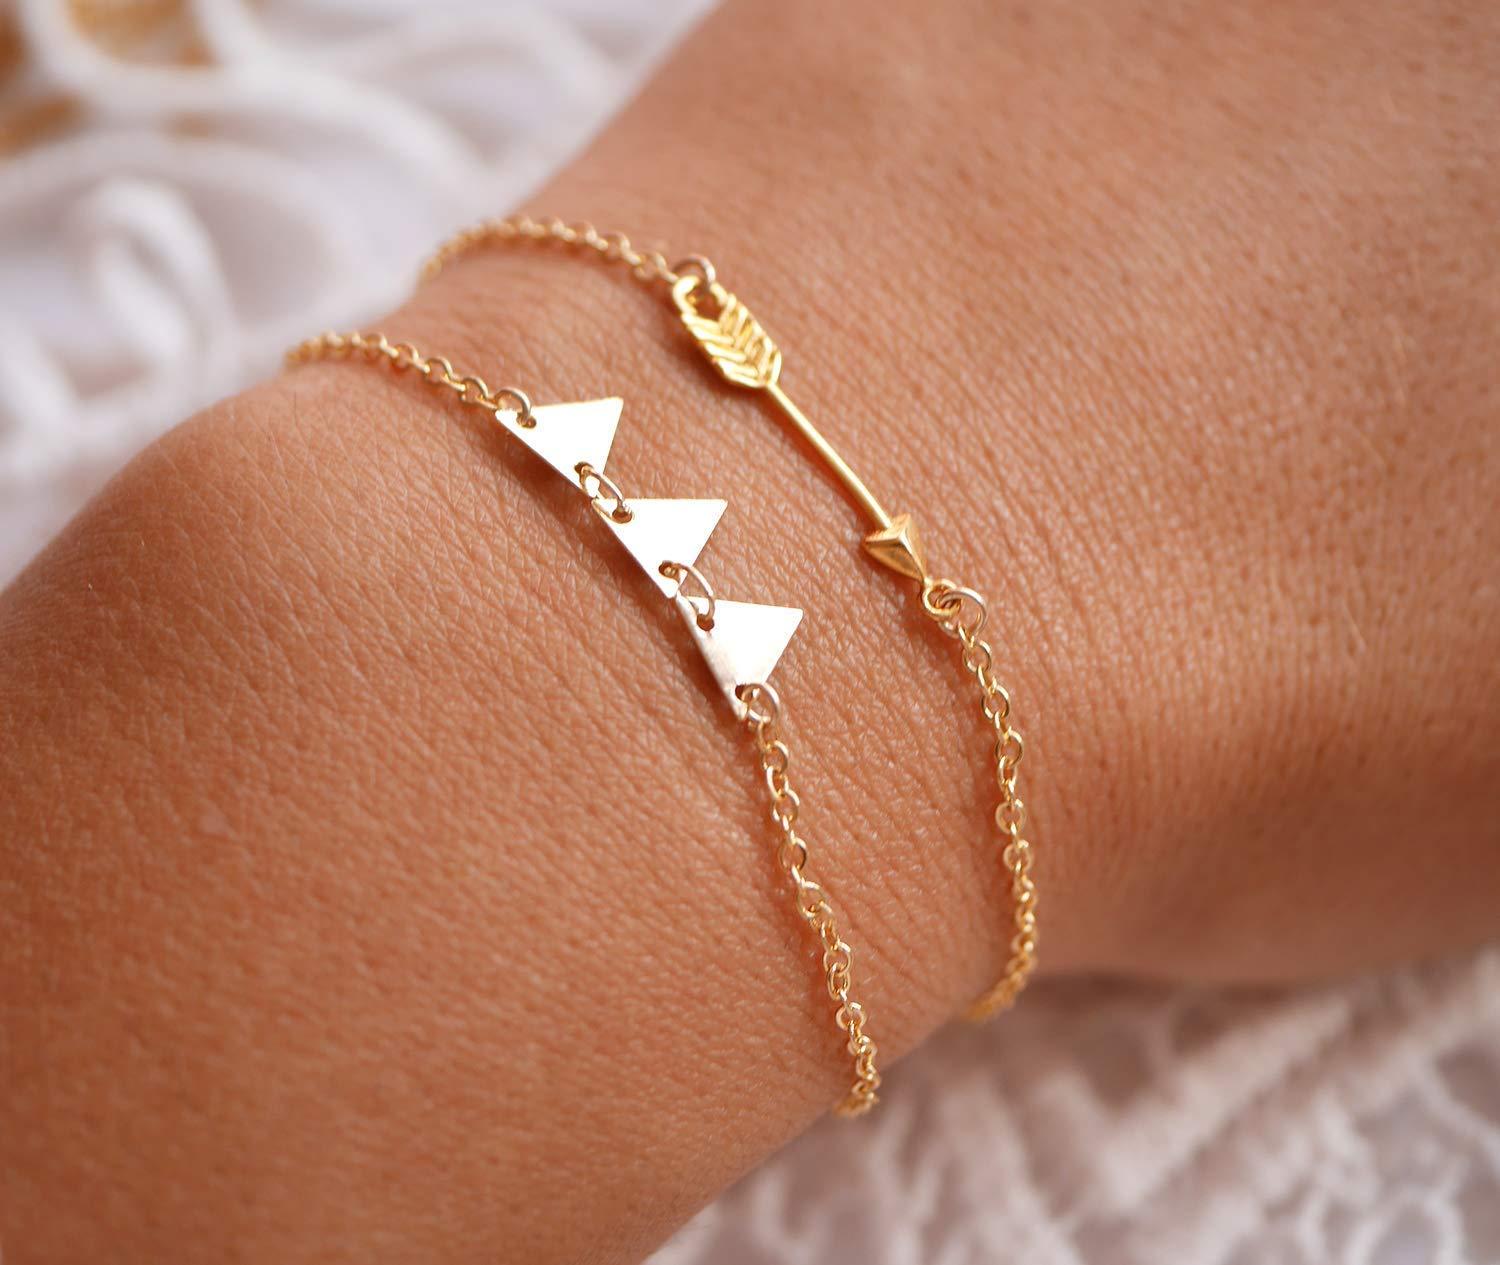 bioux g/éom/étrique bracelet fin dor/é bracelet dor/é 3 trianlges Bracelet plaqu/é or triangles bracelet g/éom/étrique